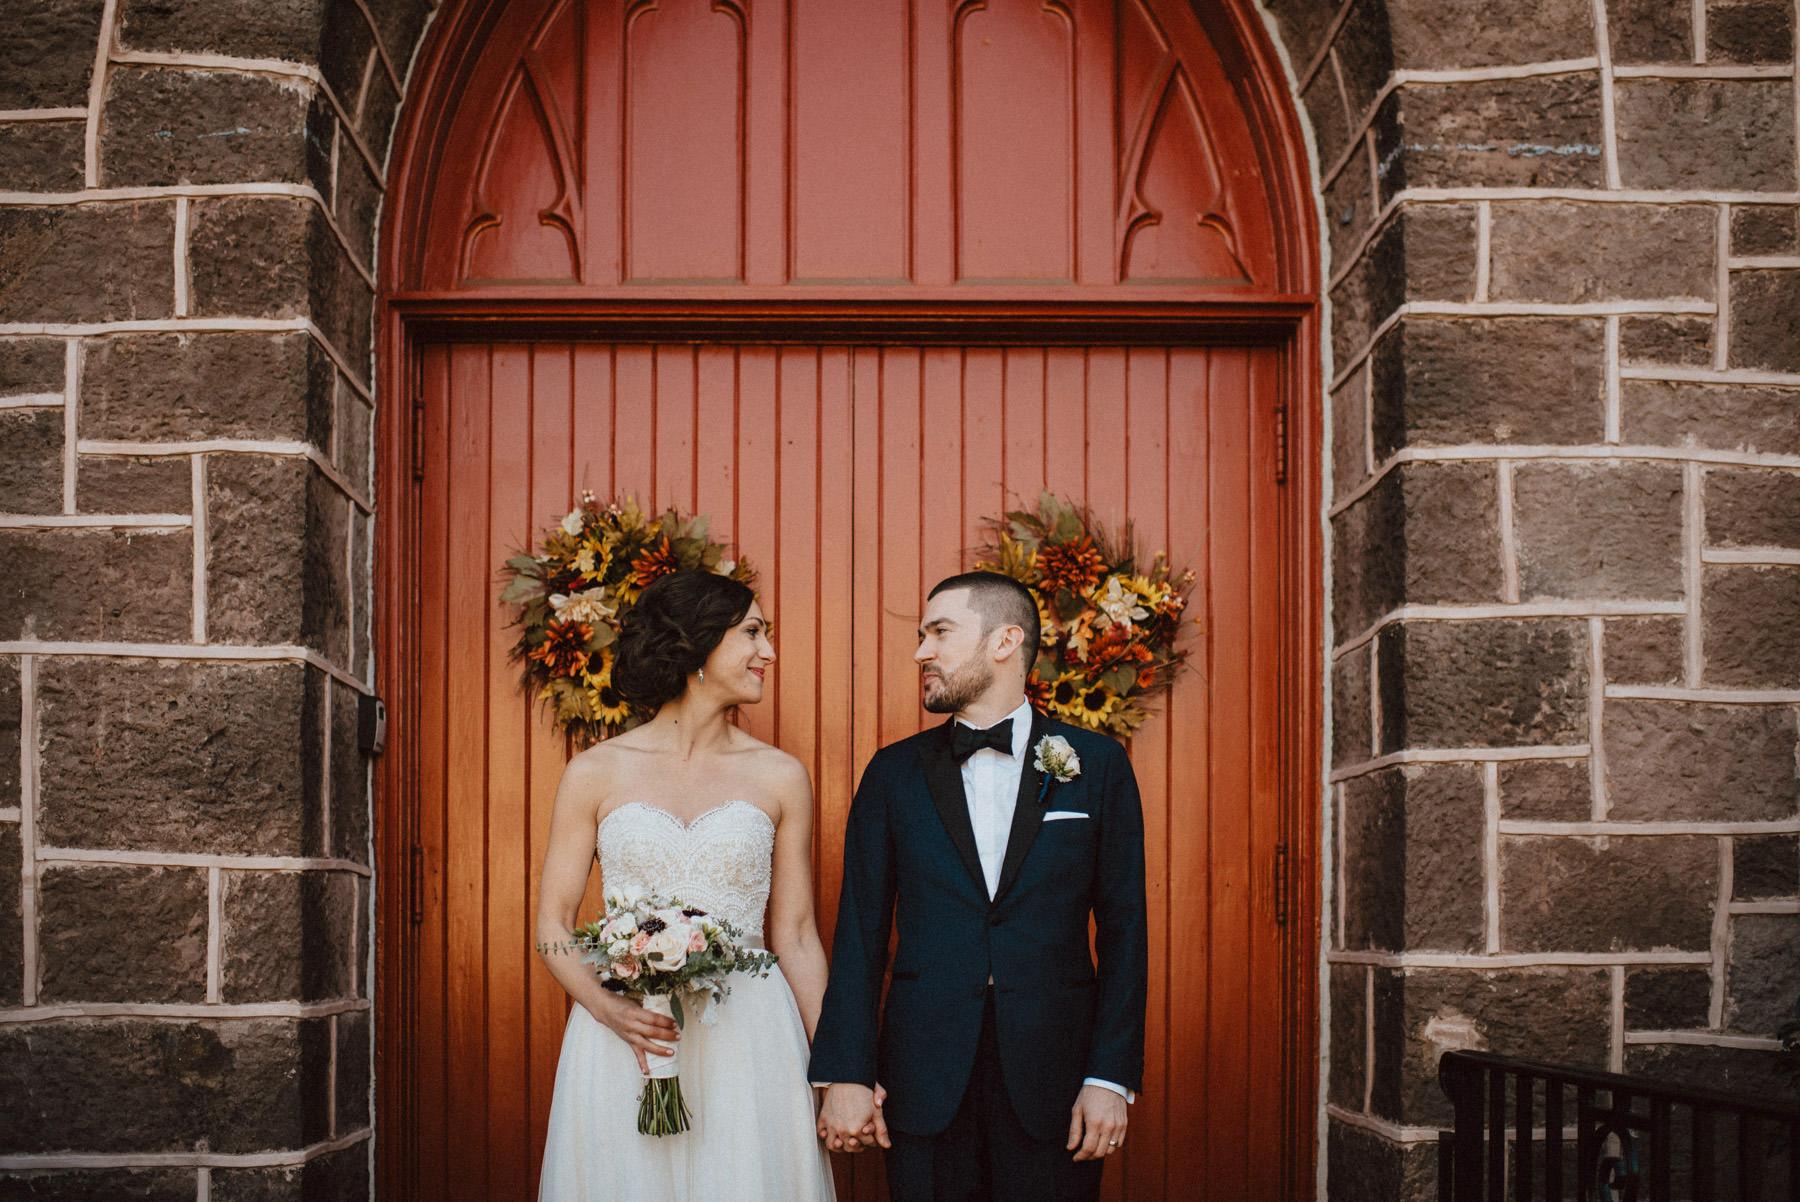 235-knowlton-mansion-wedding-4-2.jpg